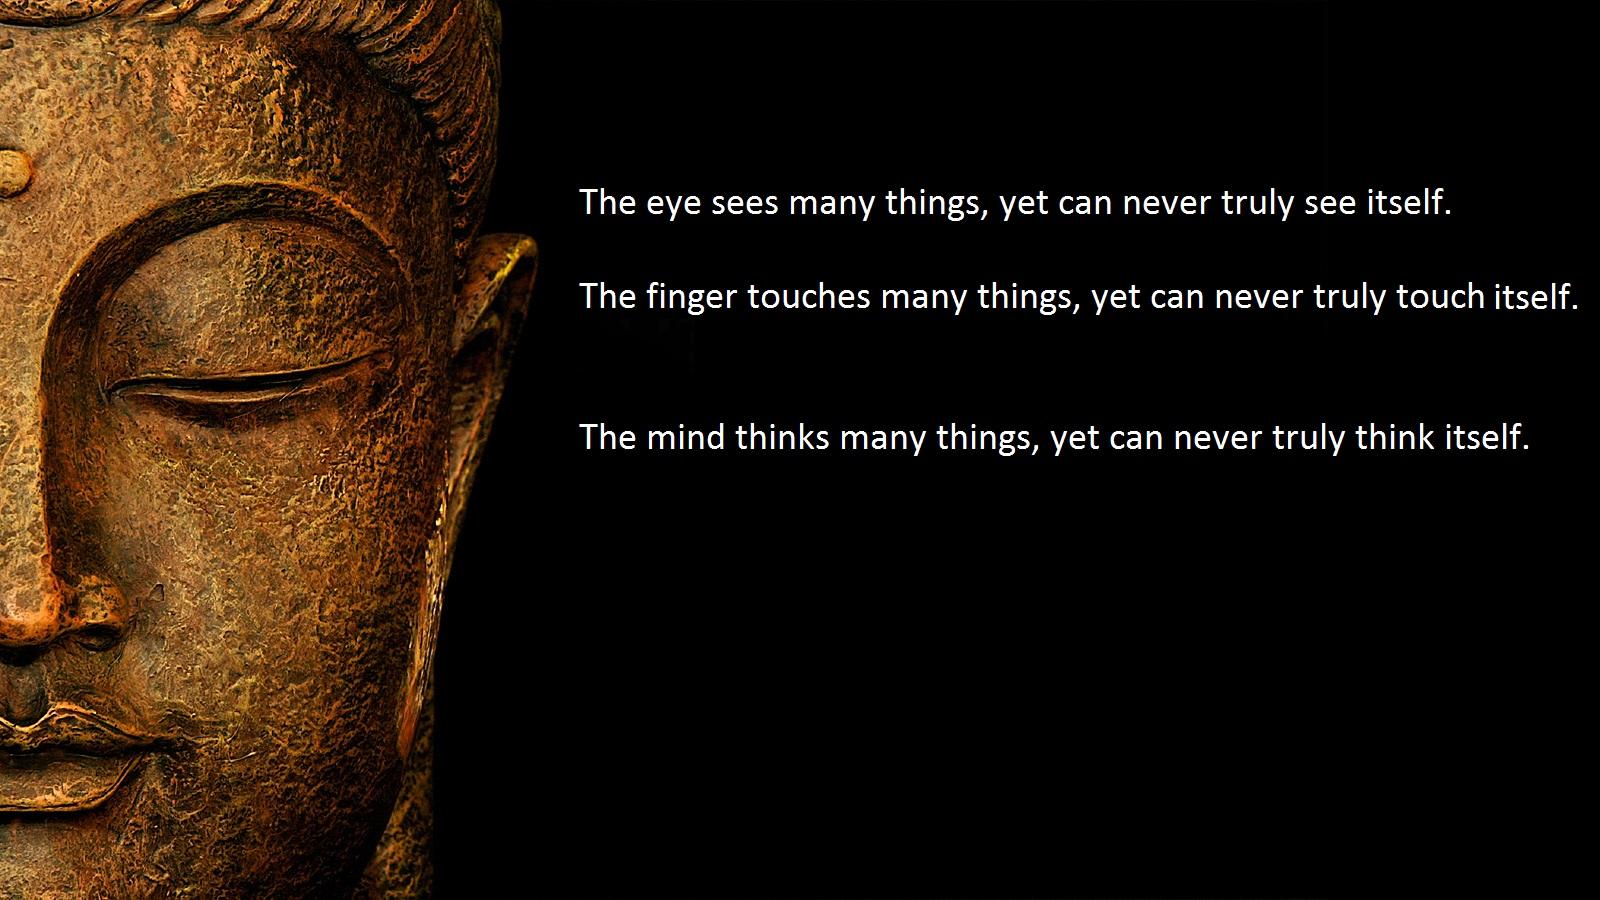 Quotes Buddha Wallpaper 1600x900 Quotes Buddha Siddartha 1600x900